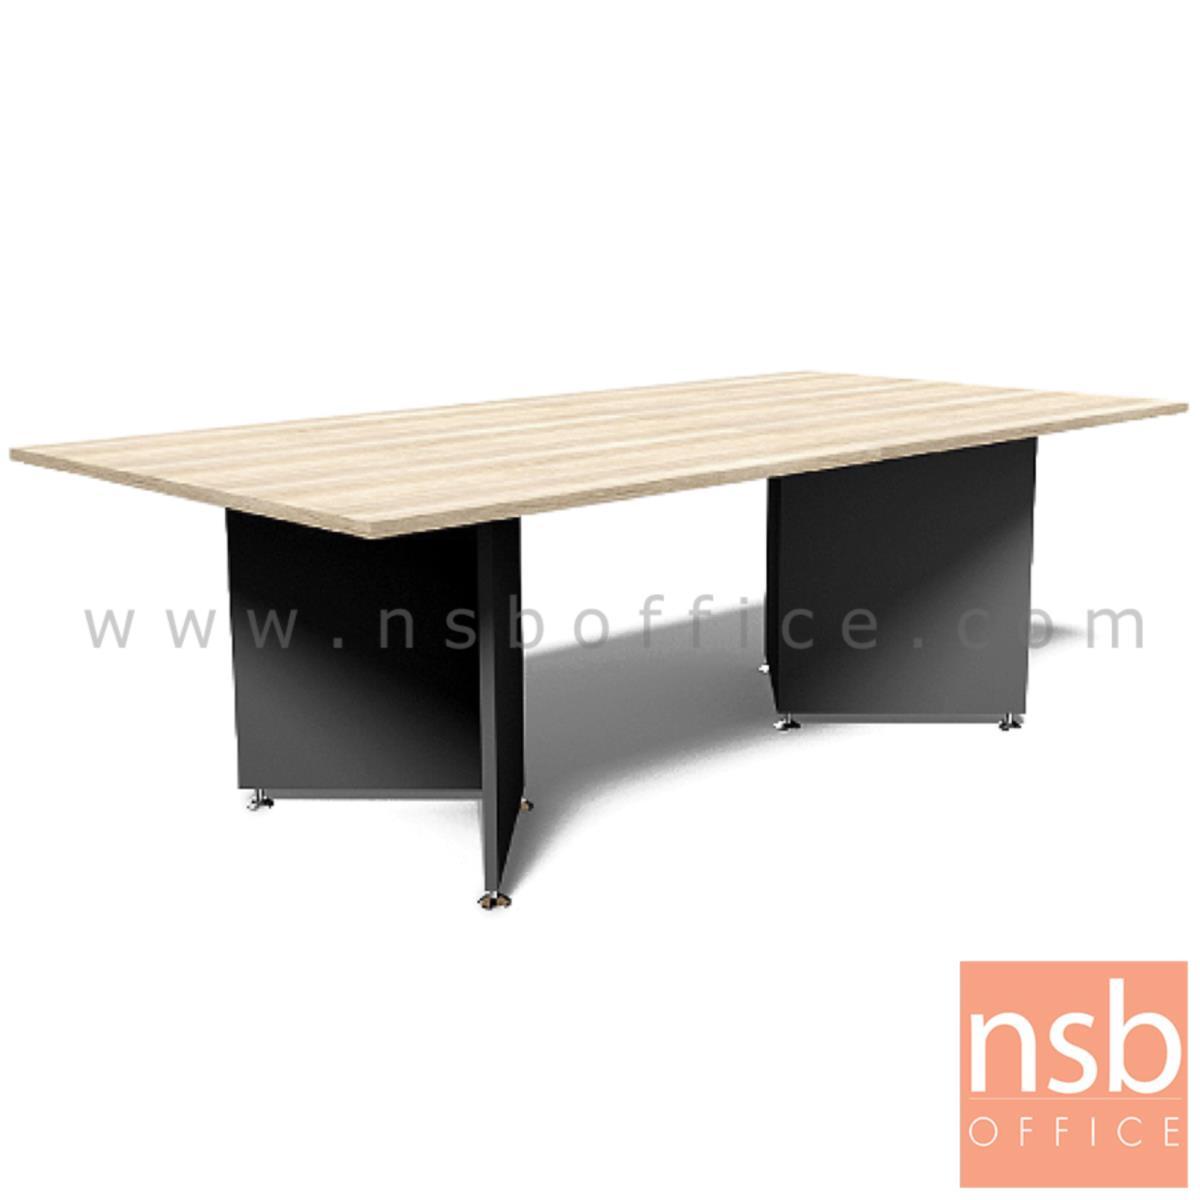 A35A015:โต๊ะประชุมทรงสี่เหลี่ยม รุ่น Moritz (มอริทซ์) ขนาด 240W cm. สีแกรนโอ๊คตัดกราไฟท์